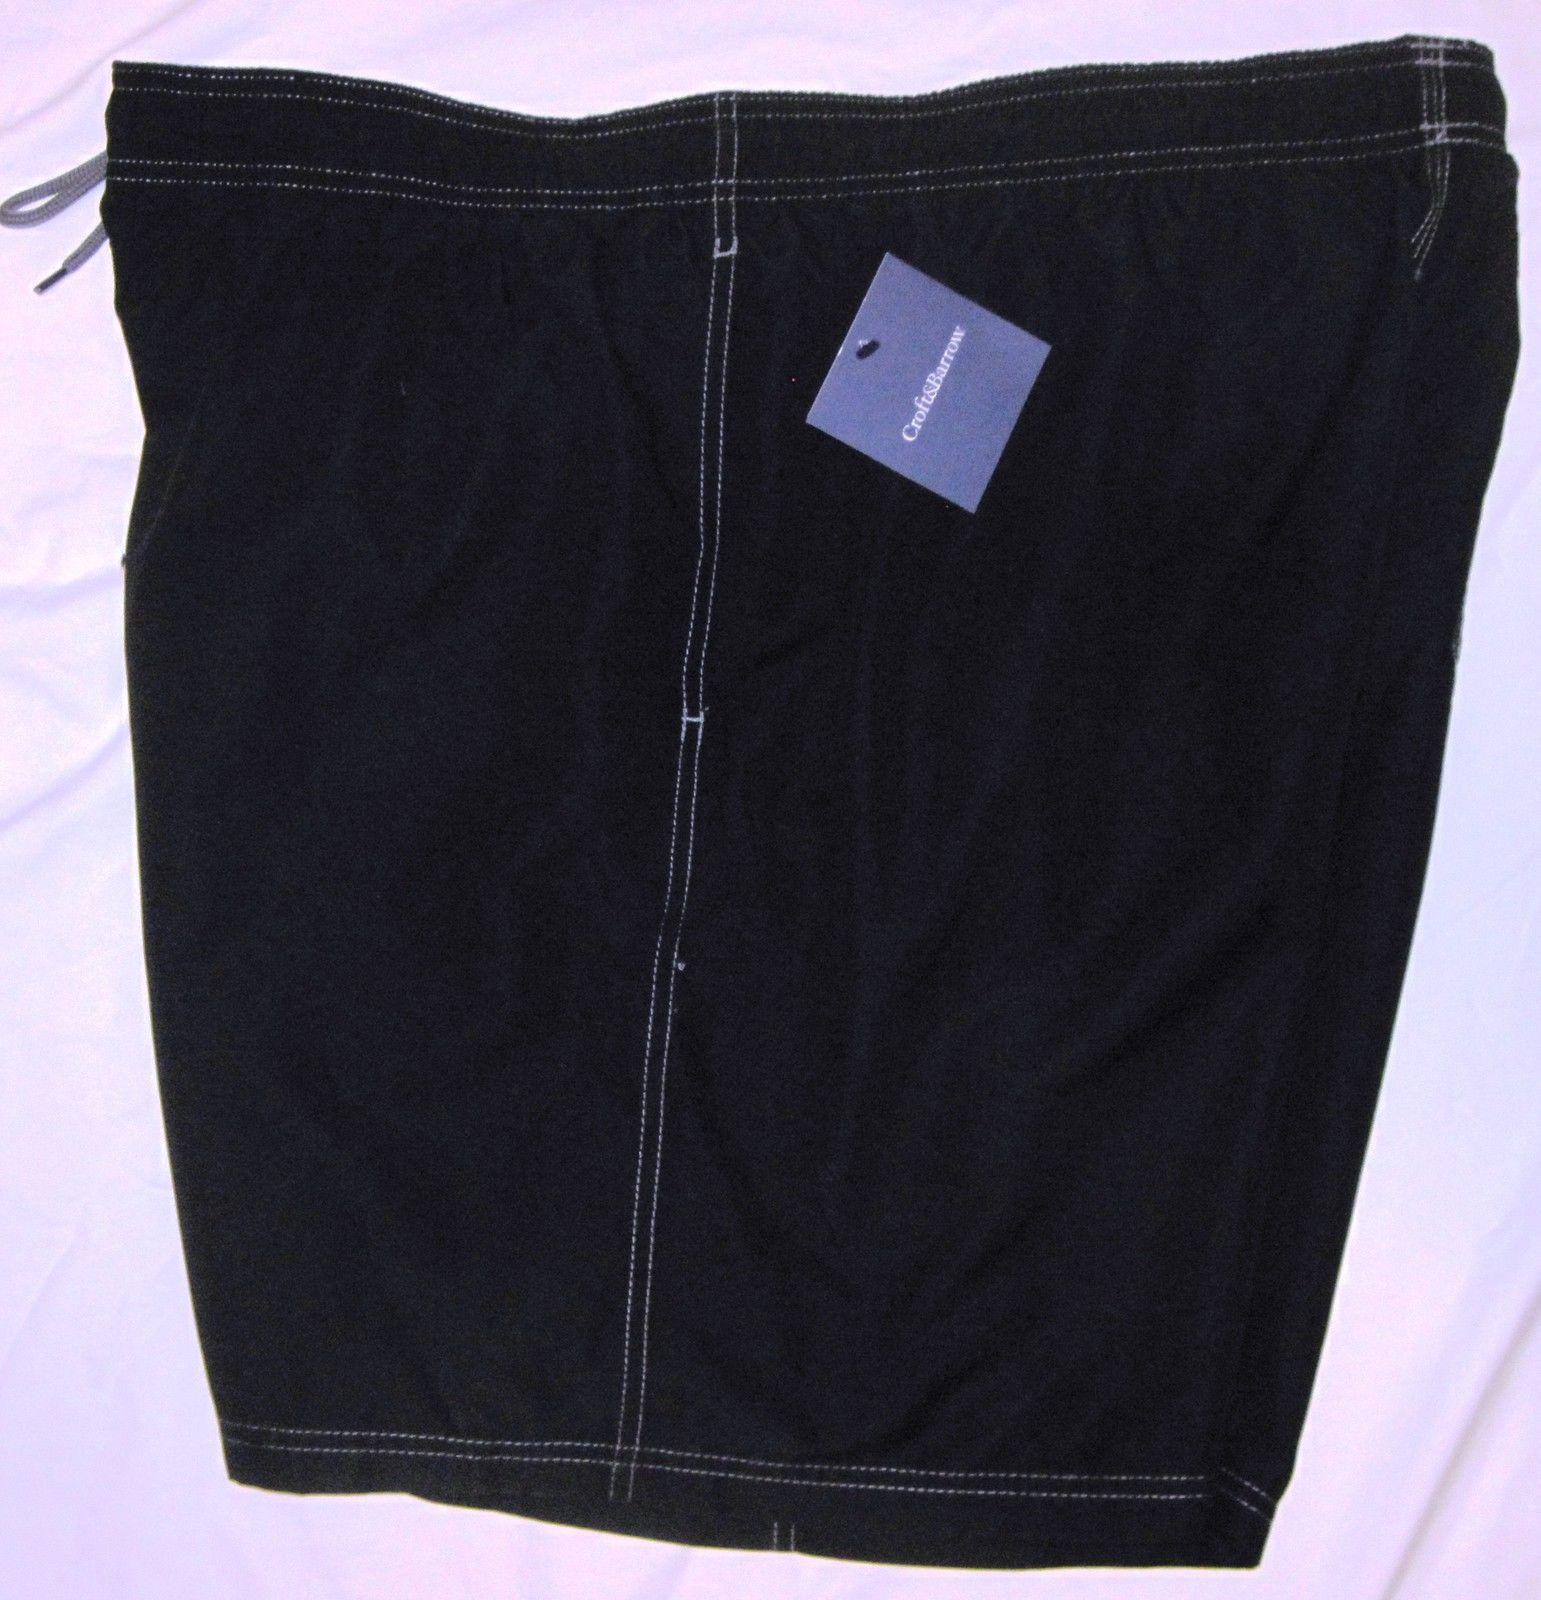 NWT CROFT & BARROW Swim Bathing Suit Trunks Mens XXL black or gray solid Poly image 5